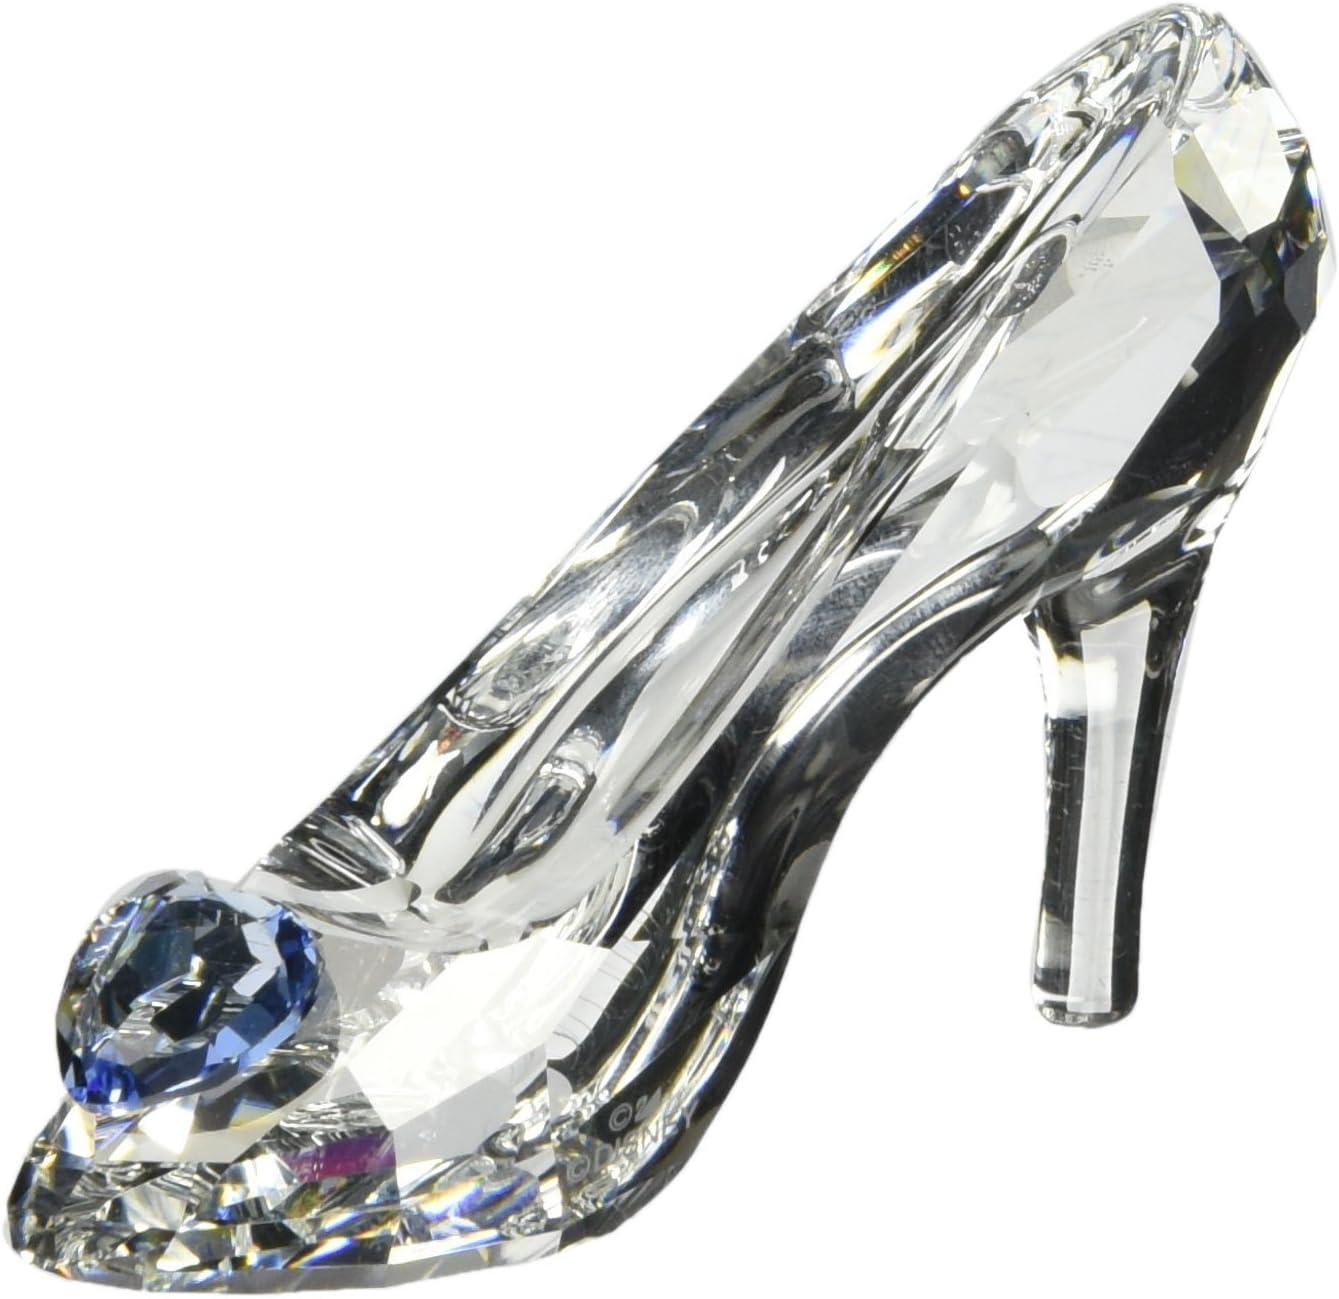 Slipper Crystal Figurine